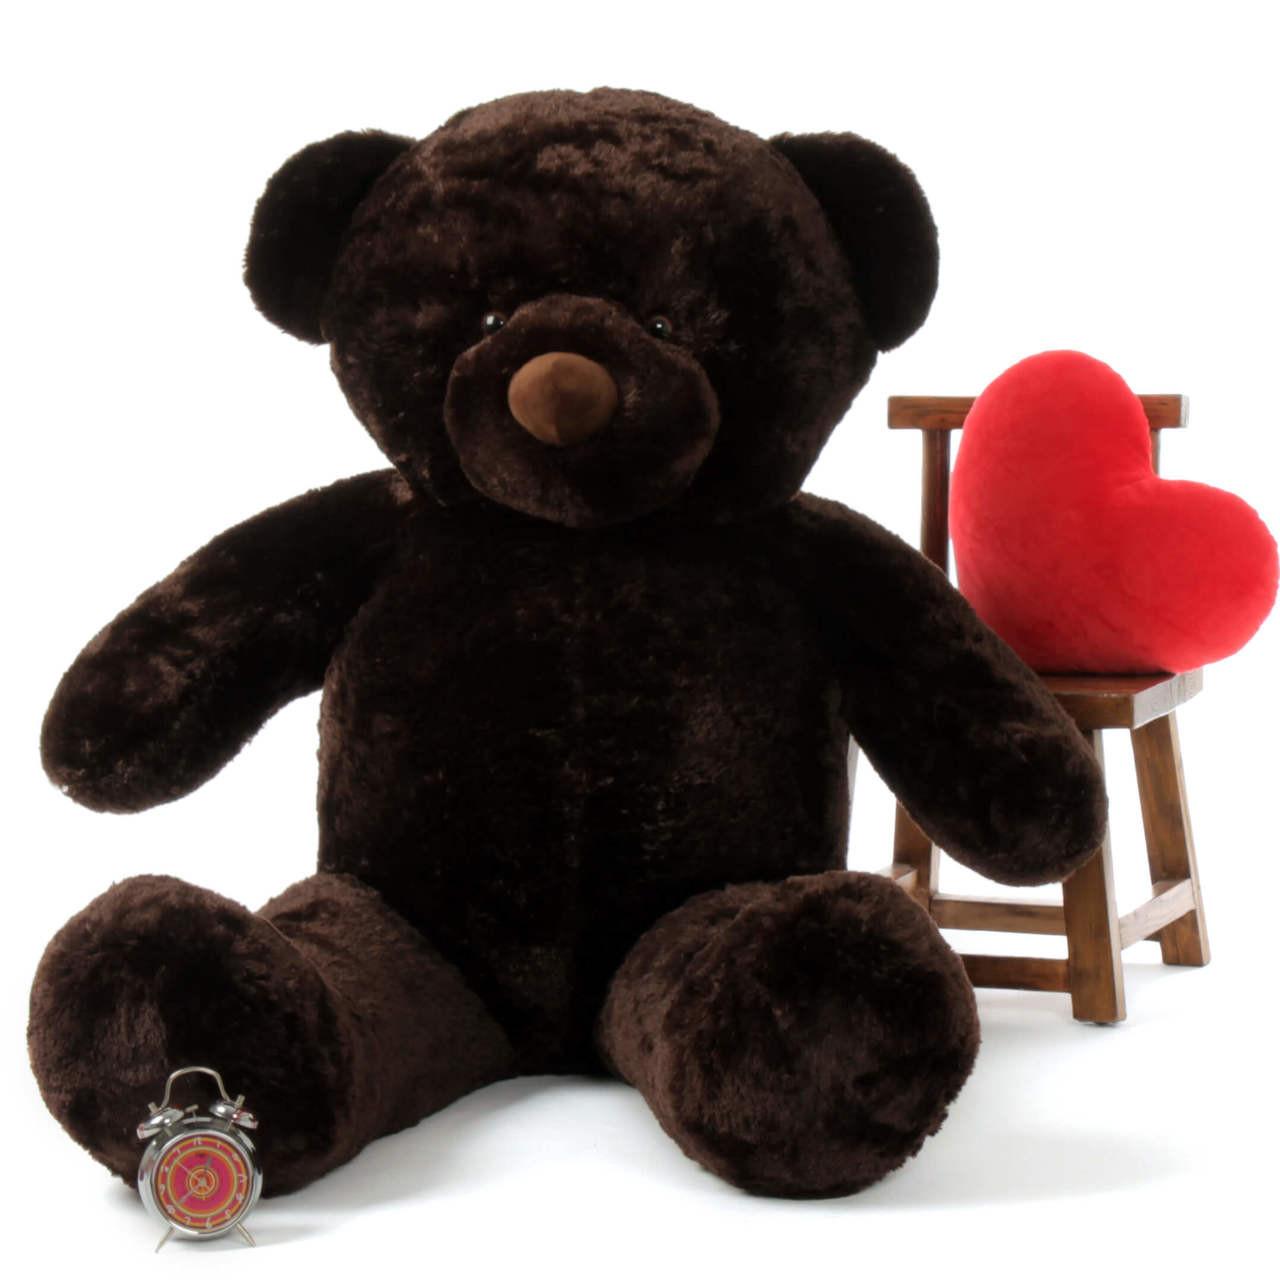 6ft most adorable Munchkin Chubs Dark Brown Teddy Bear